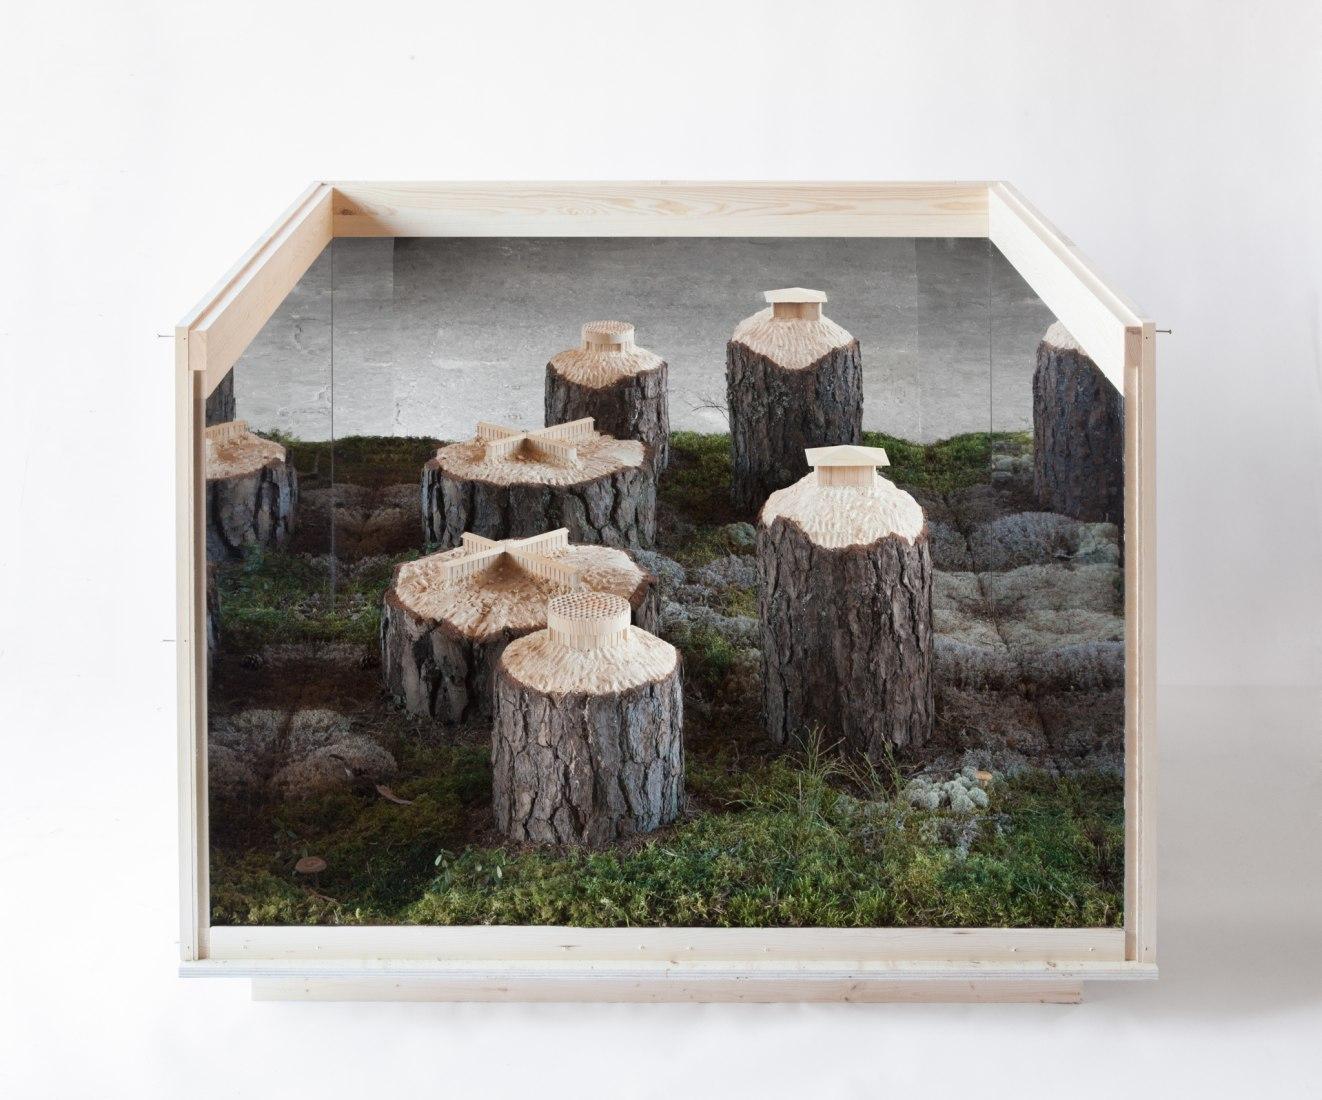 'The Naturalis Brutalis' by Krupinski/Krupinska at the Biennale Architettura di Venezia 2018. Photograph byVictor Johansson